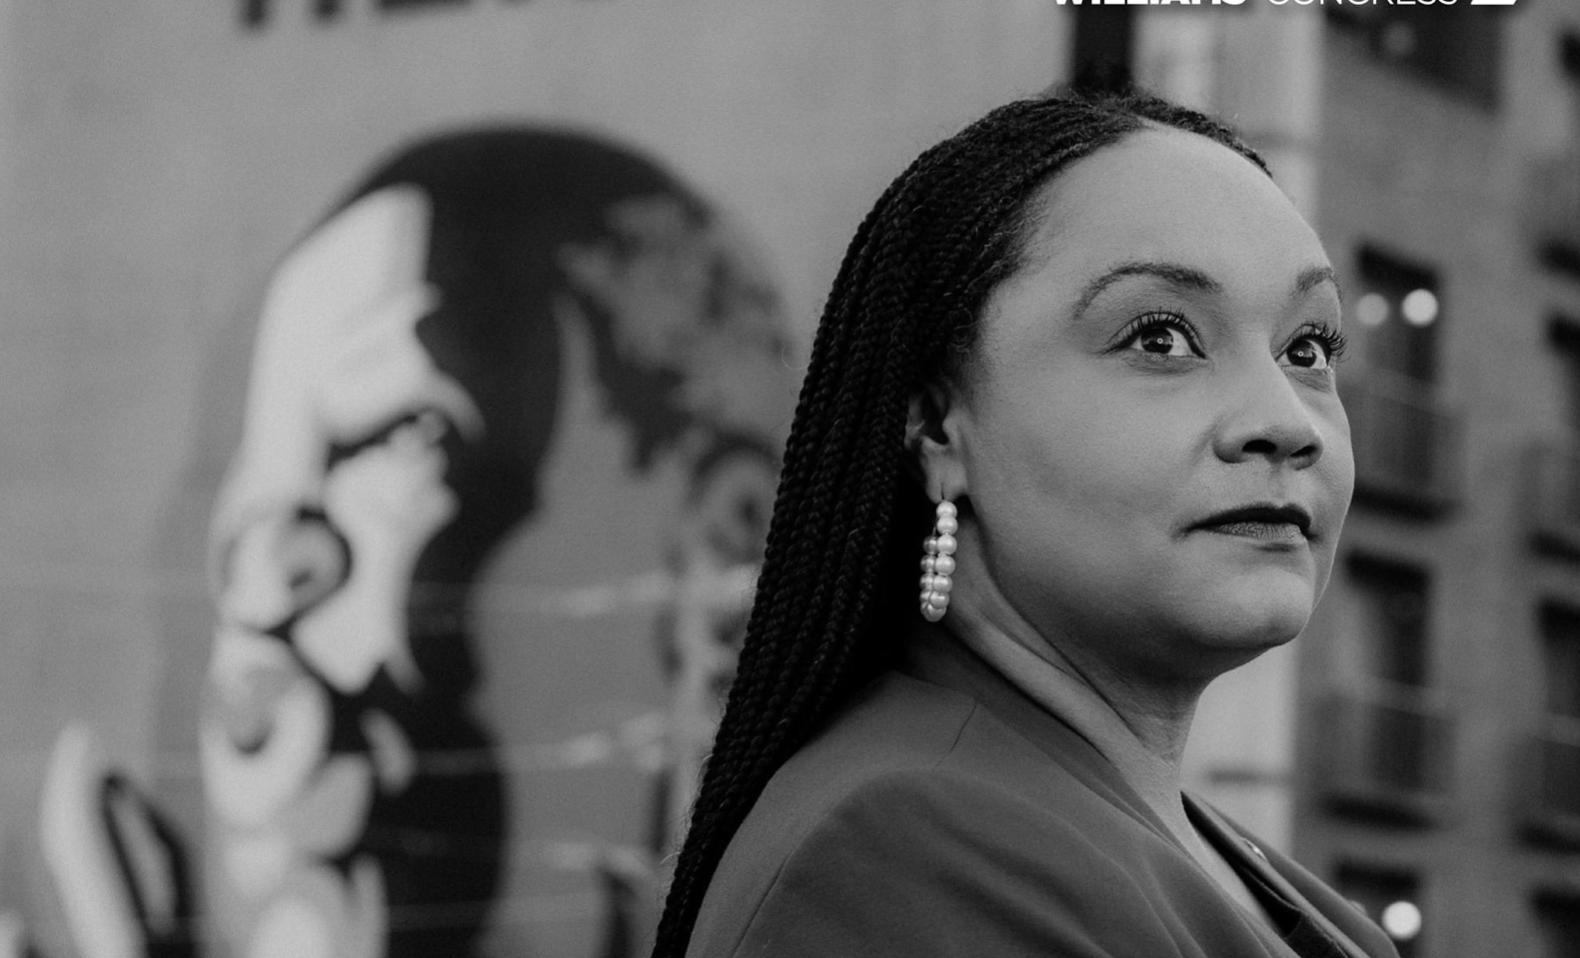 'Good Trouble': Nikema Williams Wins The Late Rep. John Lewis' Congressional Seat